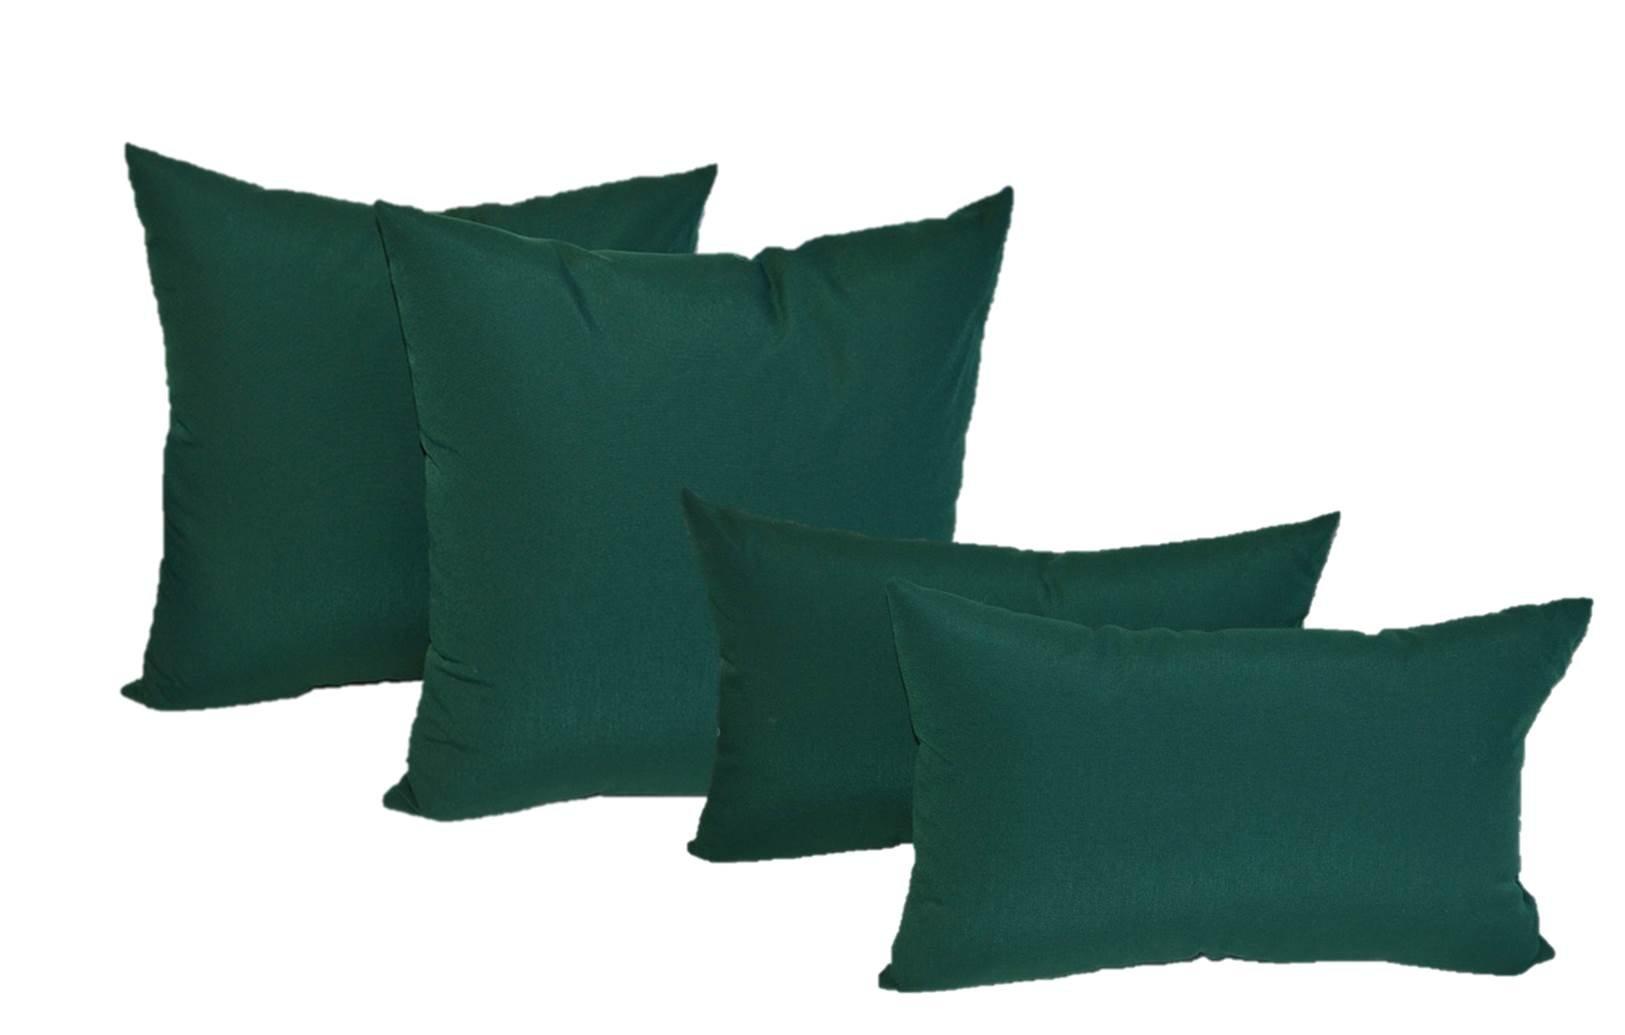 Set of 4 Indoor / Outdoor Pillows - 2 Square Pillows & 2 Rectangle / Lumbar Decorative Throw Pillows - Solid Hunter / Forest Green - Choose Size (17'' x 17'' square & 11'' x 19'' lumbar)